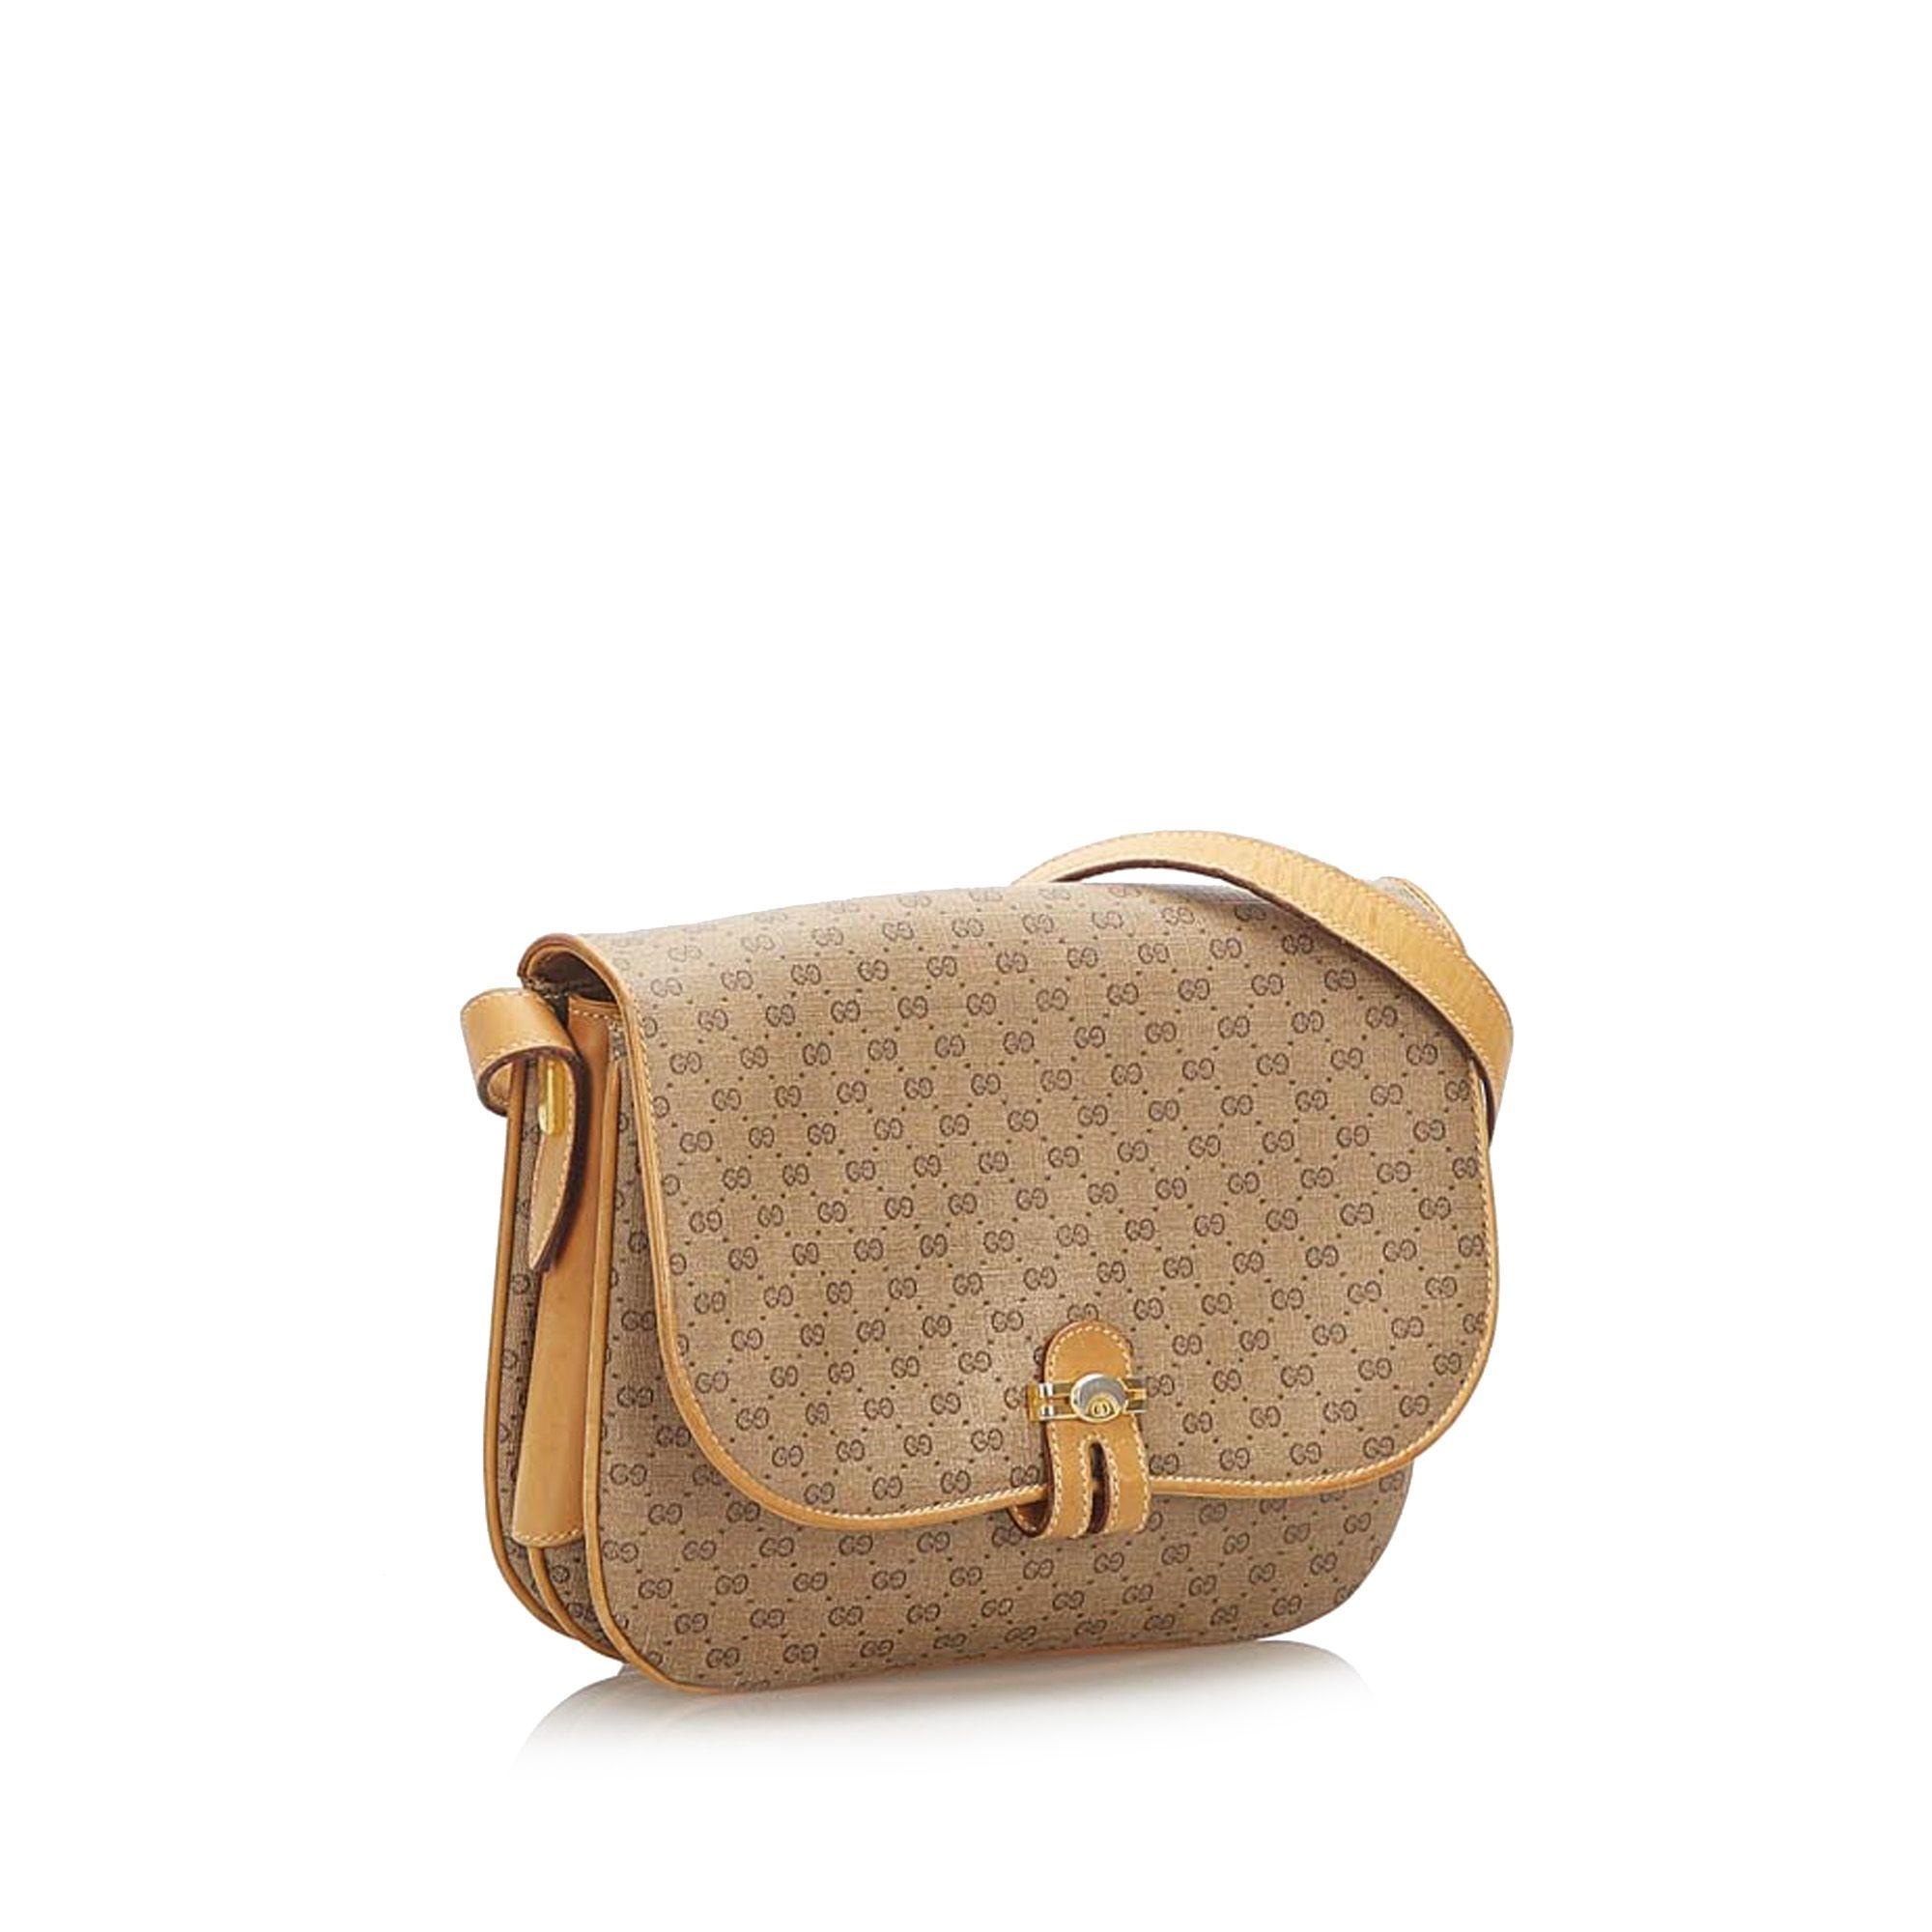 Vintage Gucci Micro GG Canvas Crossbody Bag Brown